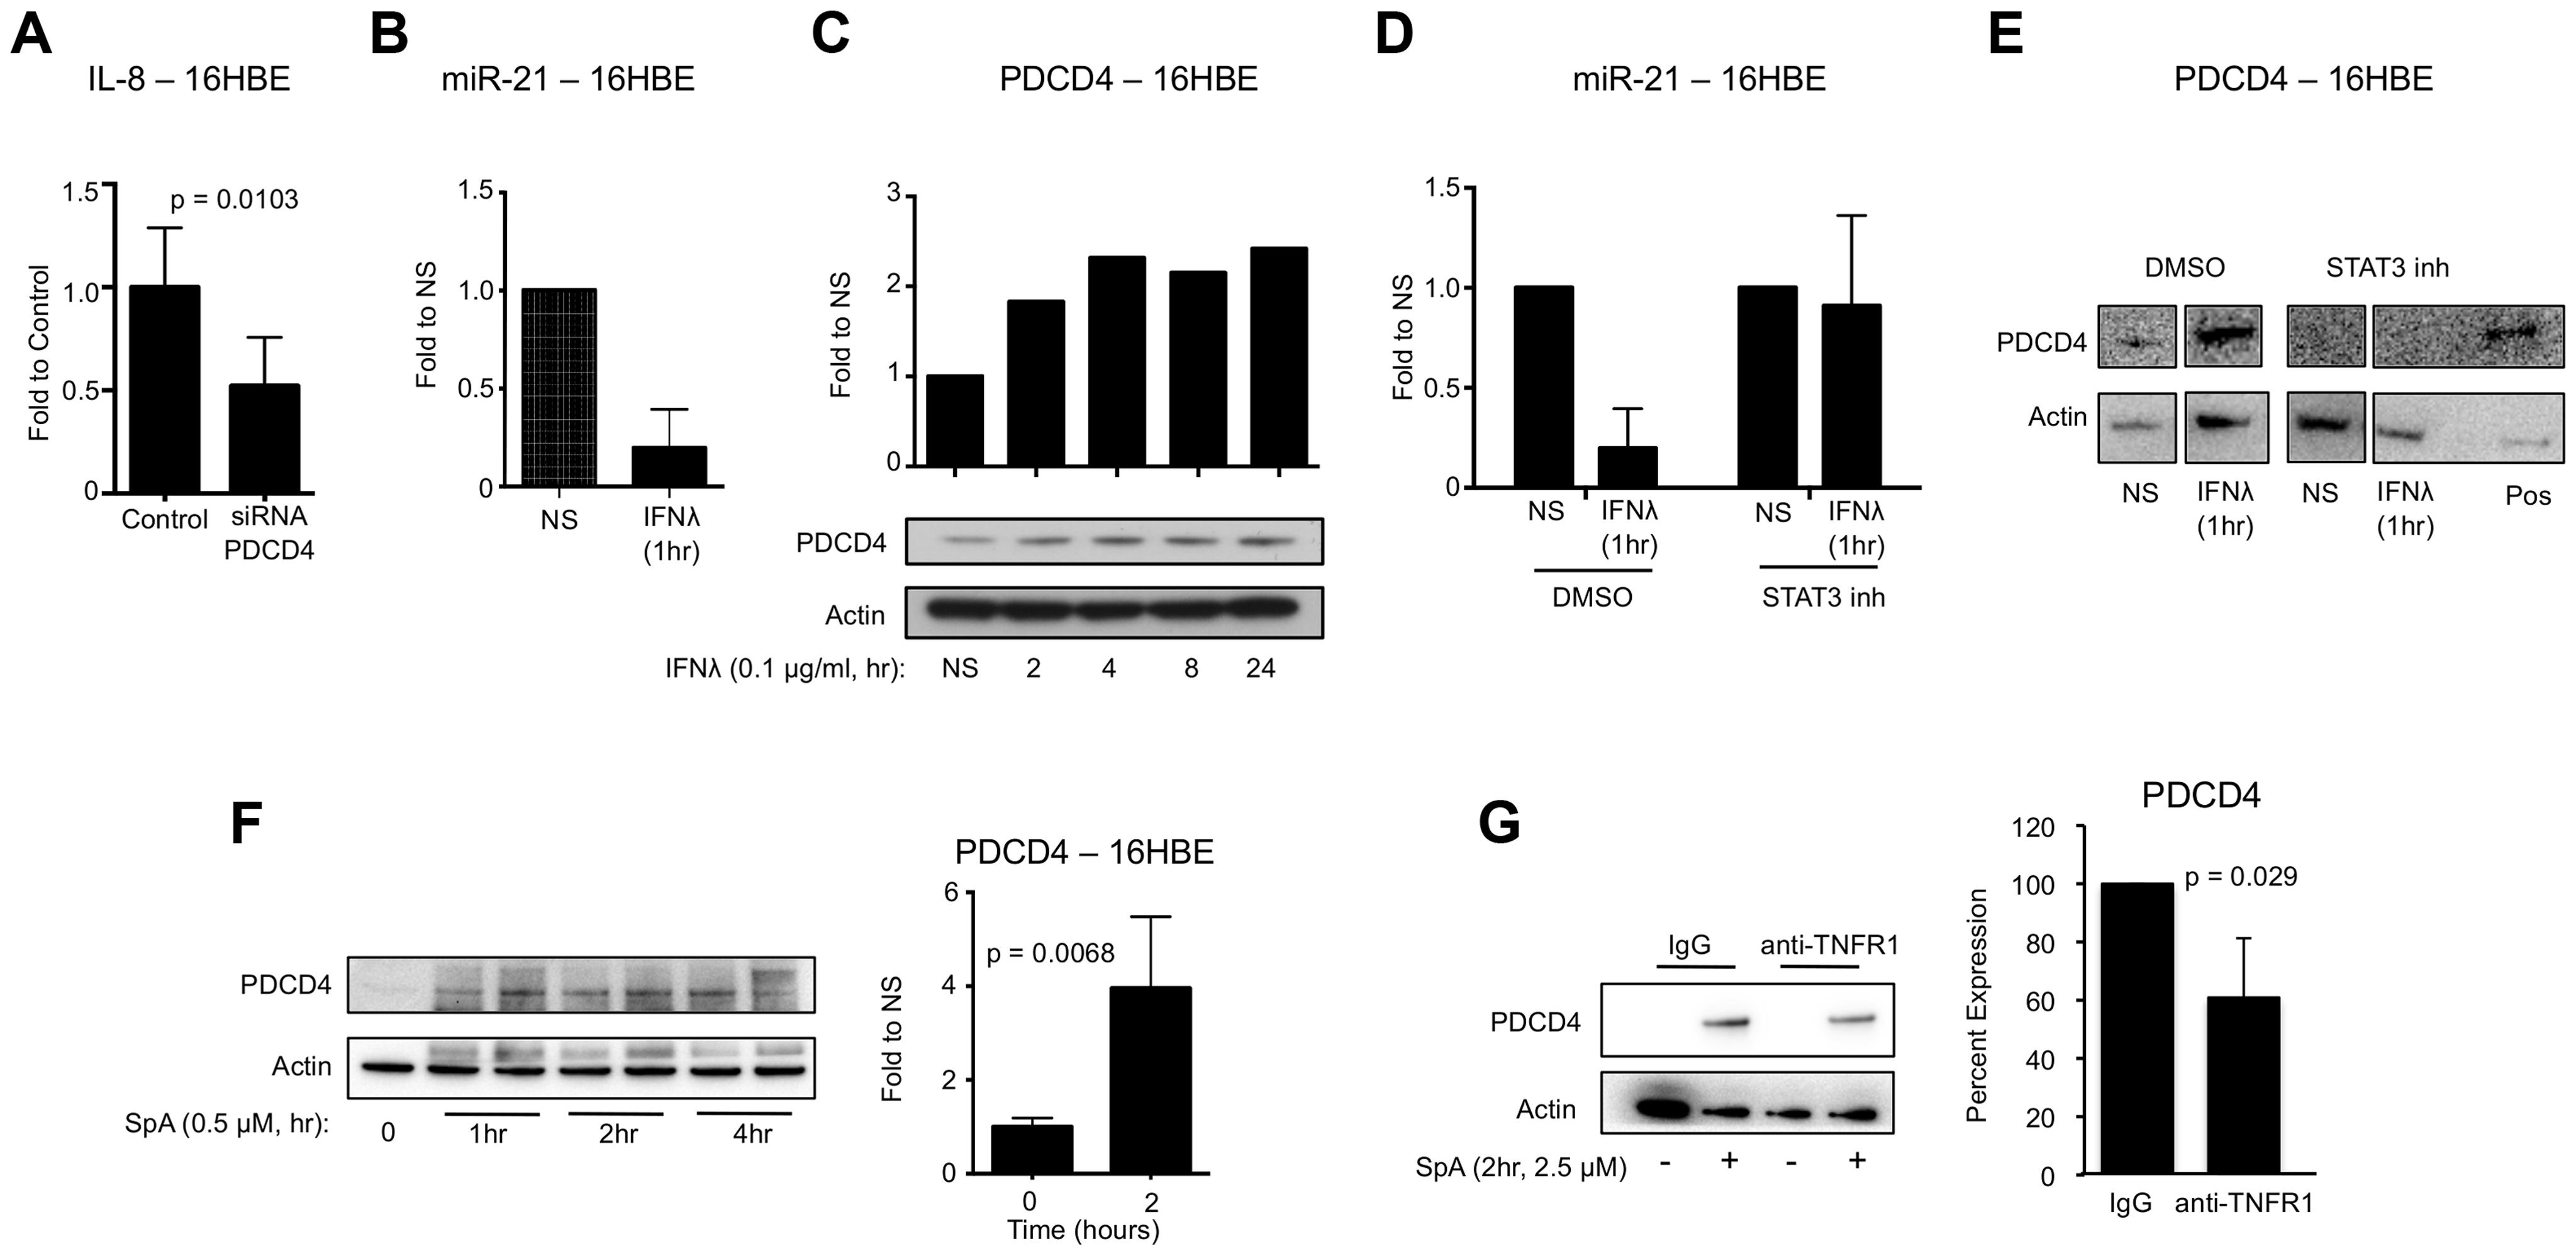 IFNλ regulation of miR-21 and PDCD4.